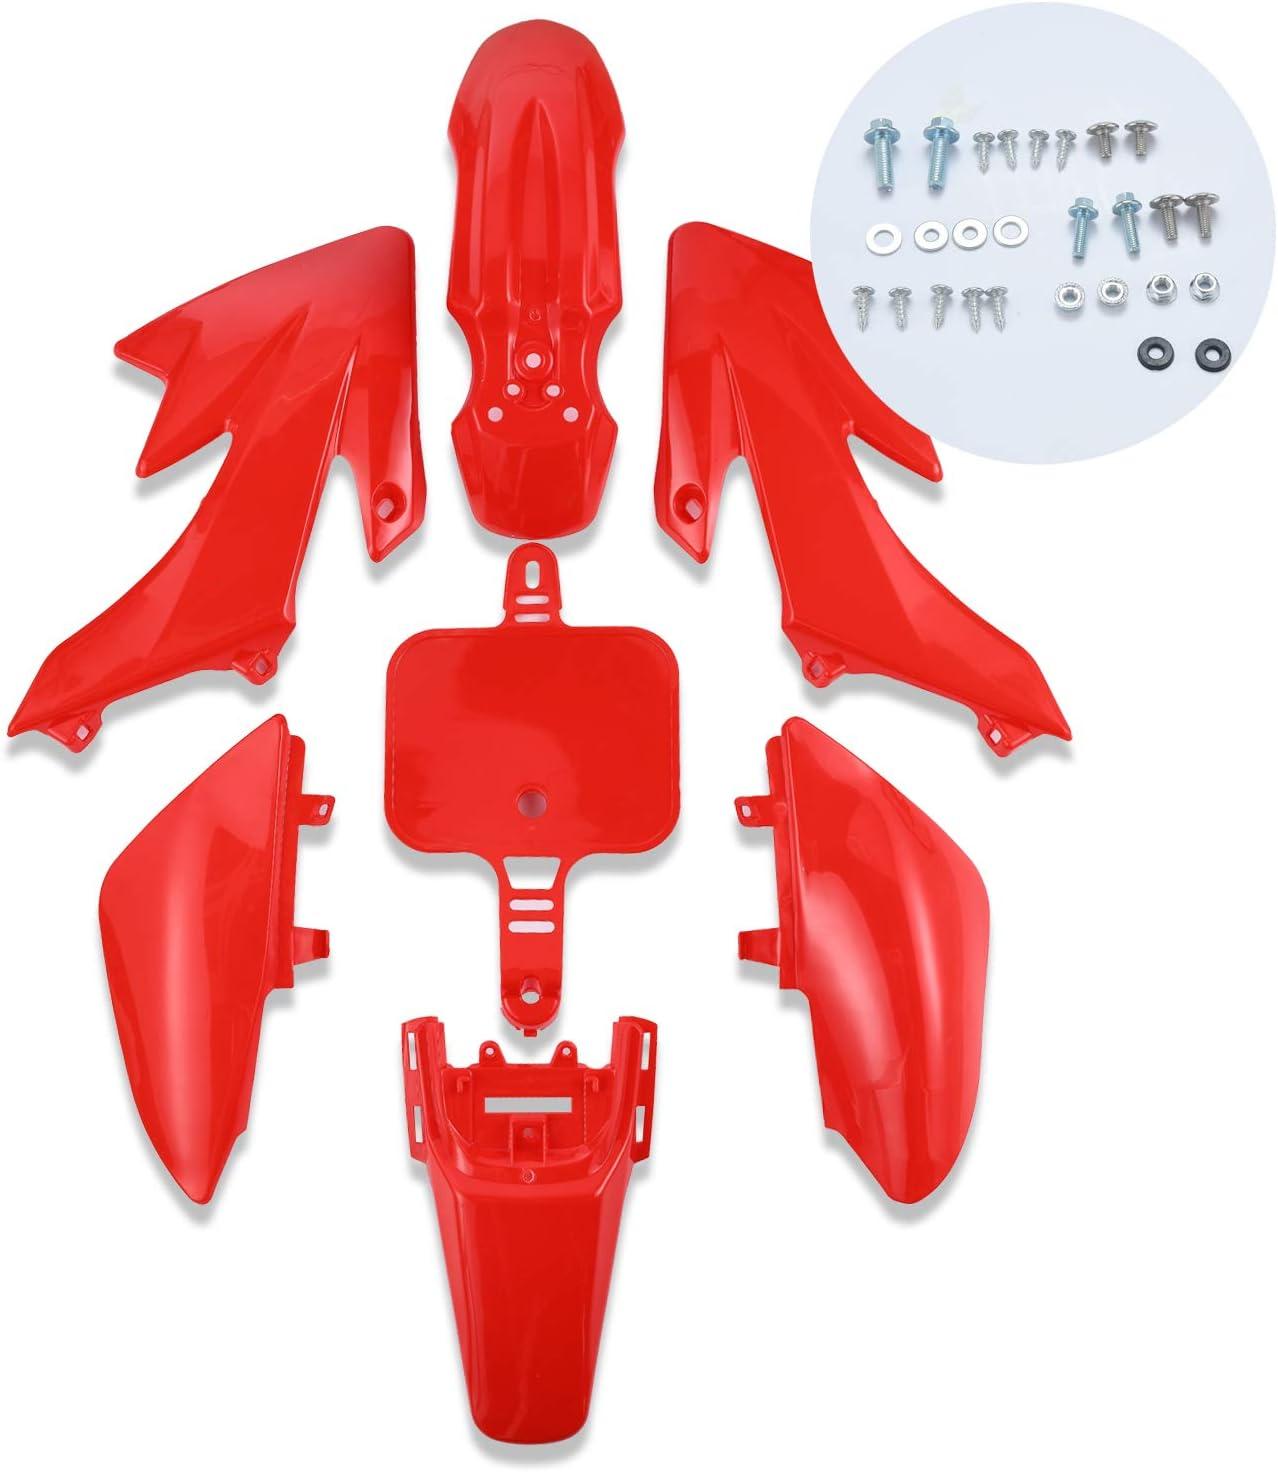 CLEO Plastic Fender Fairing Work Set,Plastic Recommendation Kit Body Overseas parallel import regular item